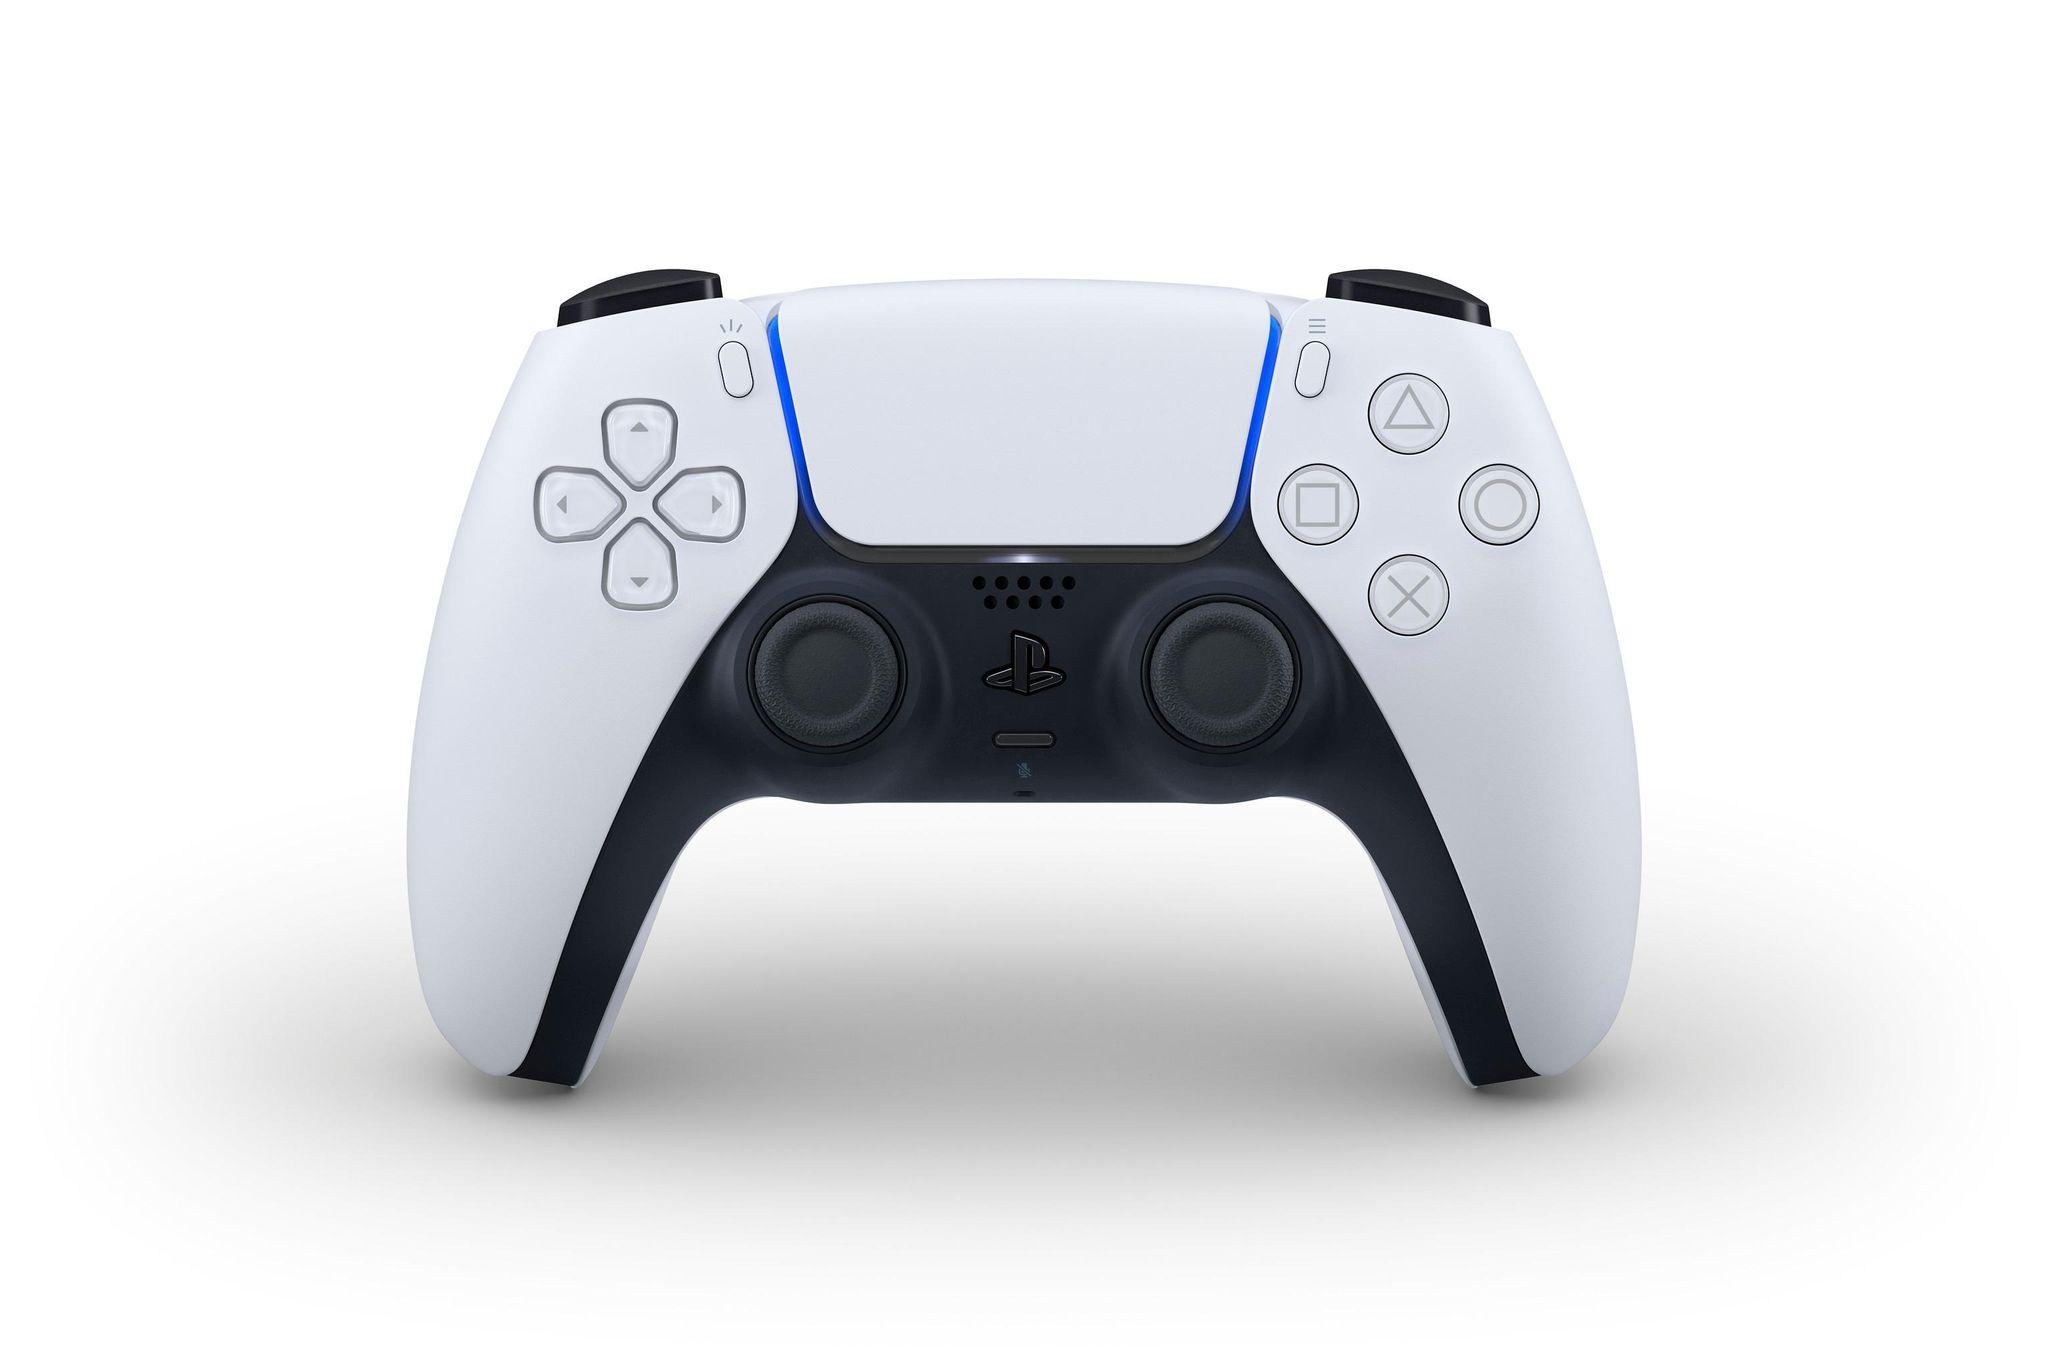 Sony unveiled the PS5 DualSense controller last April.